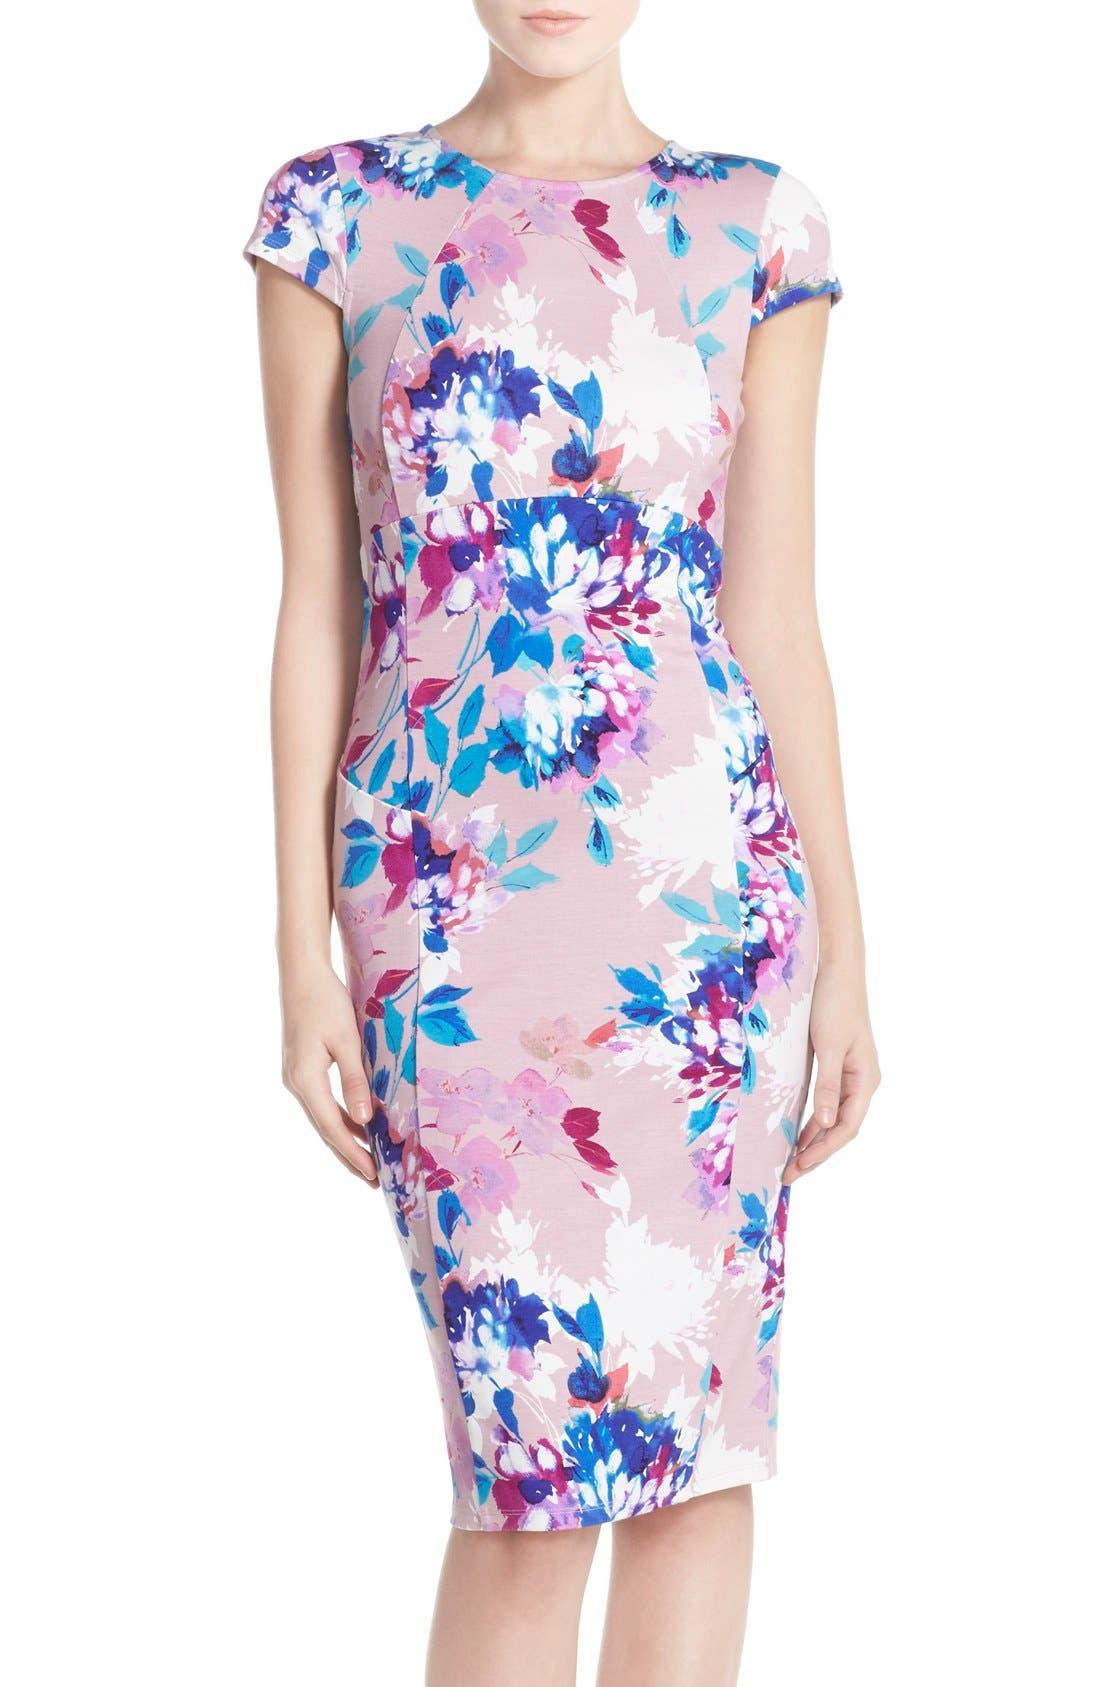 Alternate Image 1 Selected - Felicity & Coco Floral Ponte Sheath Dress (Regular & Petite) (Nordstrom Exclusive)